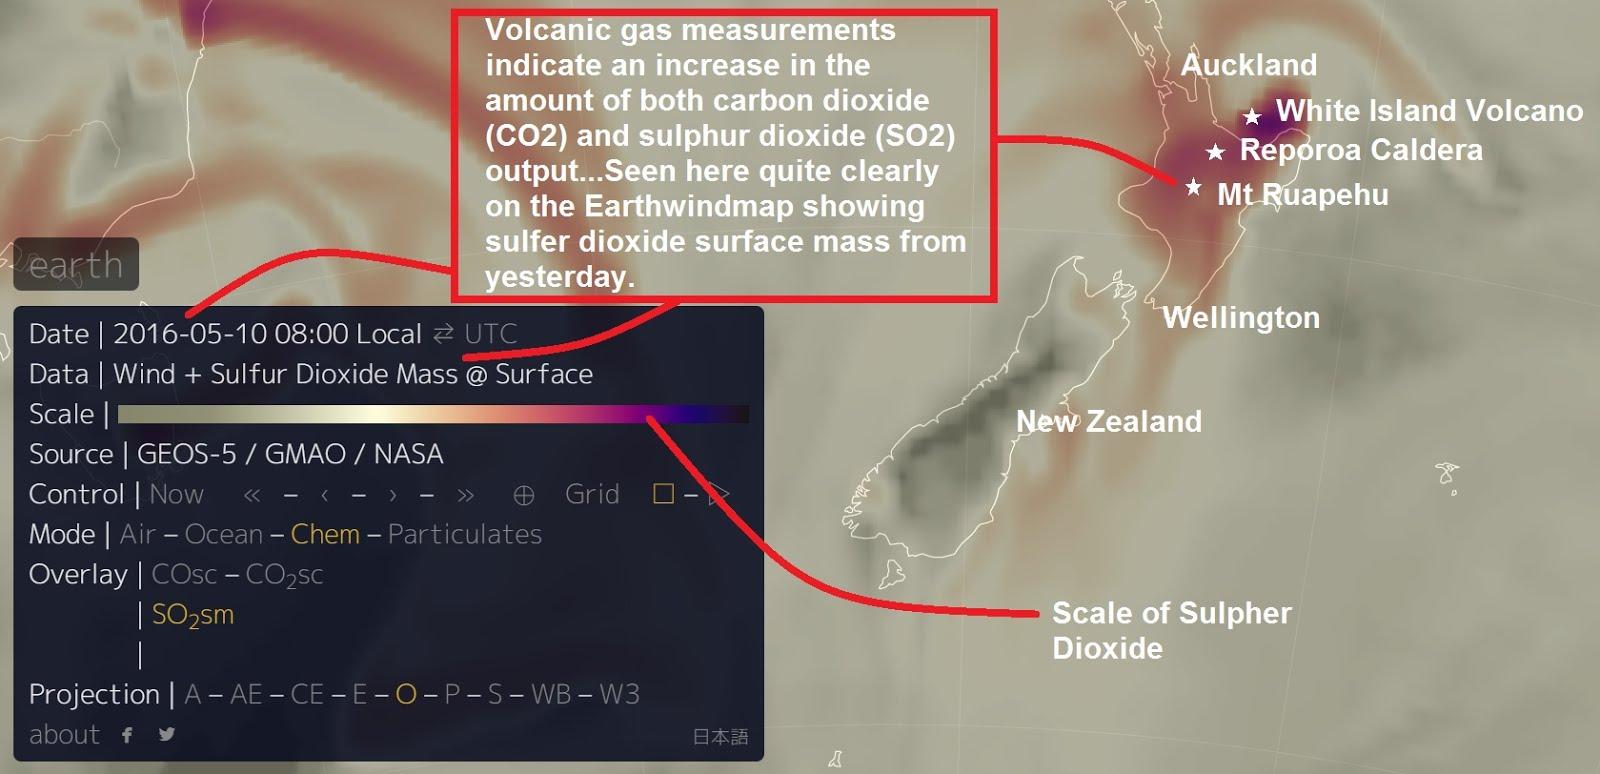 "New Zealand's North Island home of ""Super Volcano"" Reporoa Caldera, the colossus Mt Ruapehu and..."